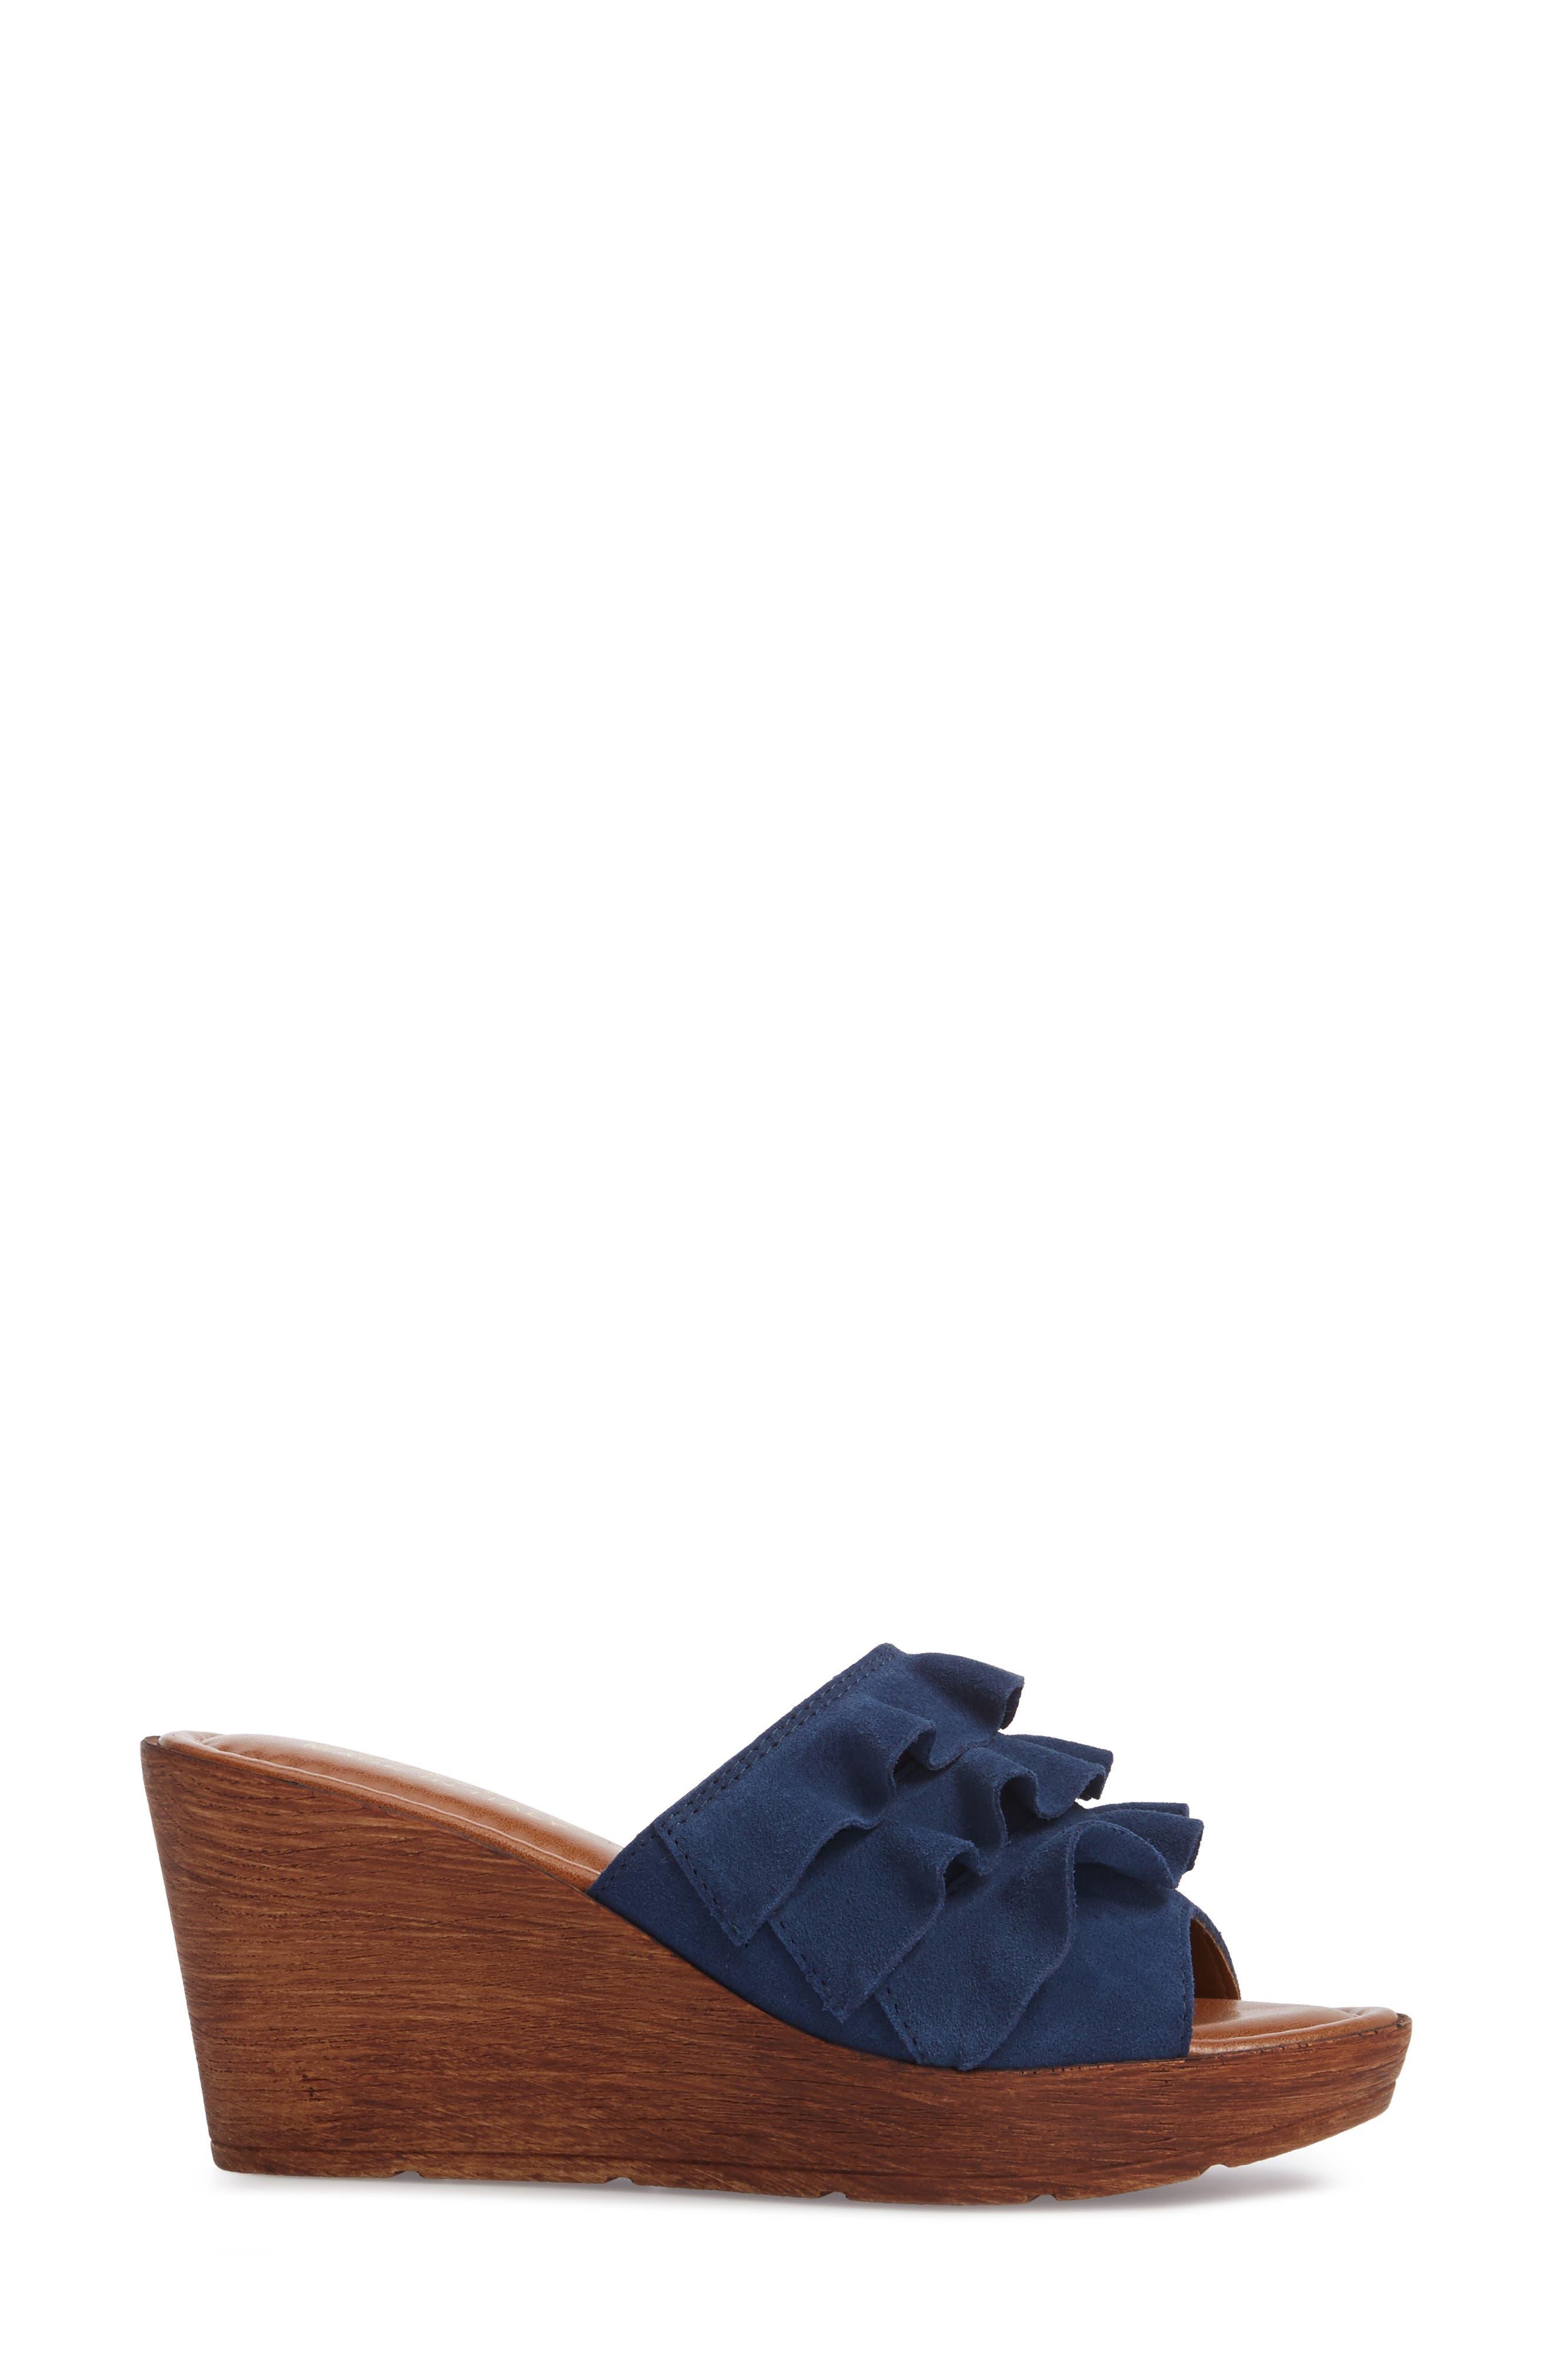 Bey Platform Wedge Sandal,                             Alternate thumbnail 3, color,                             NAVY SUEDE